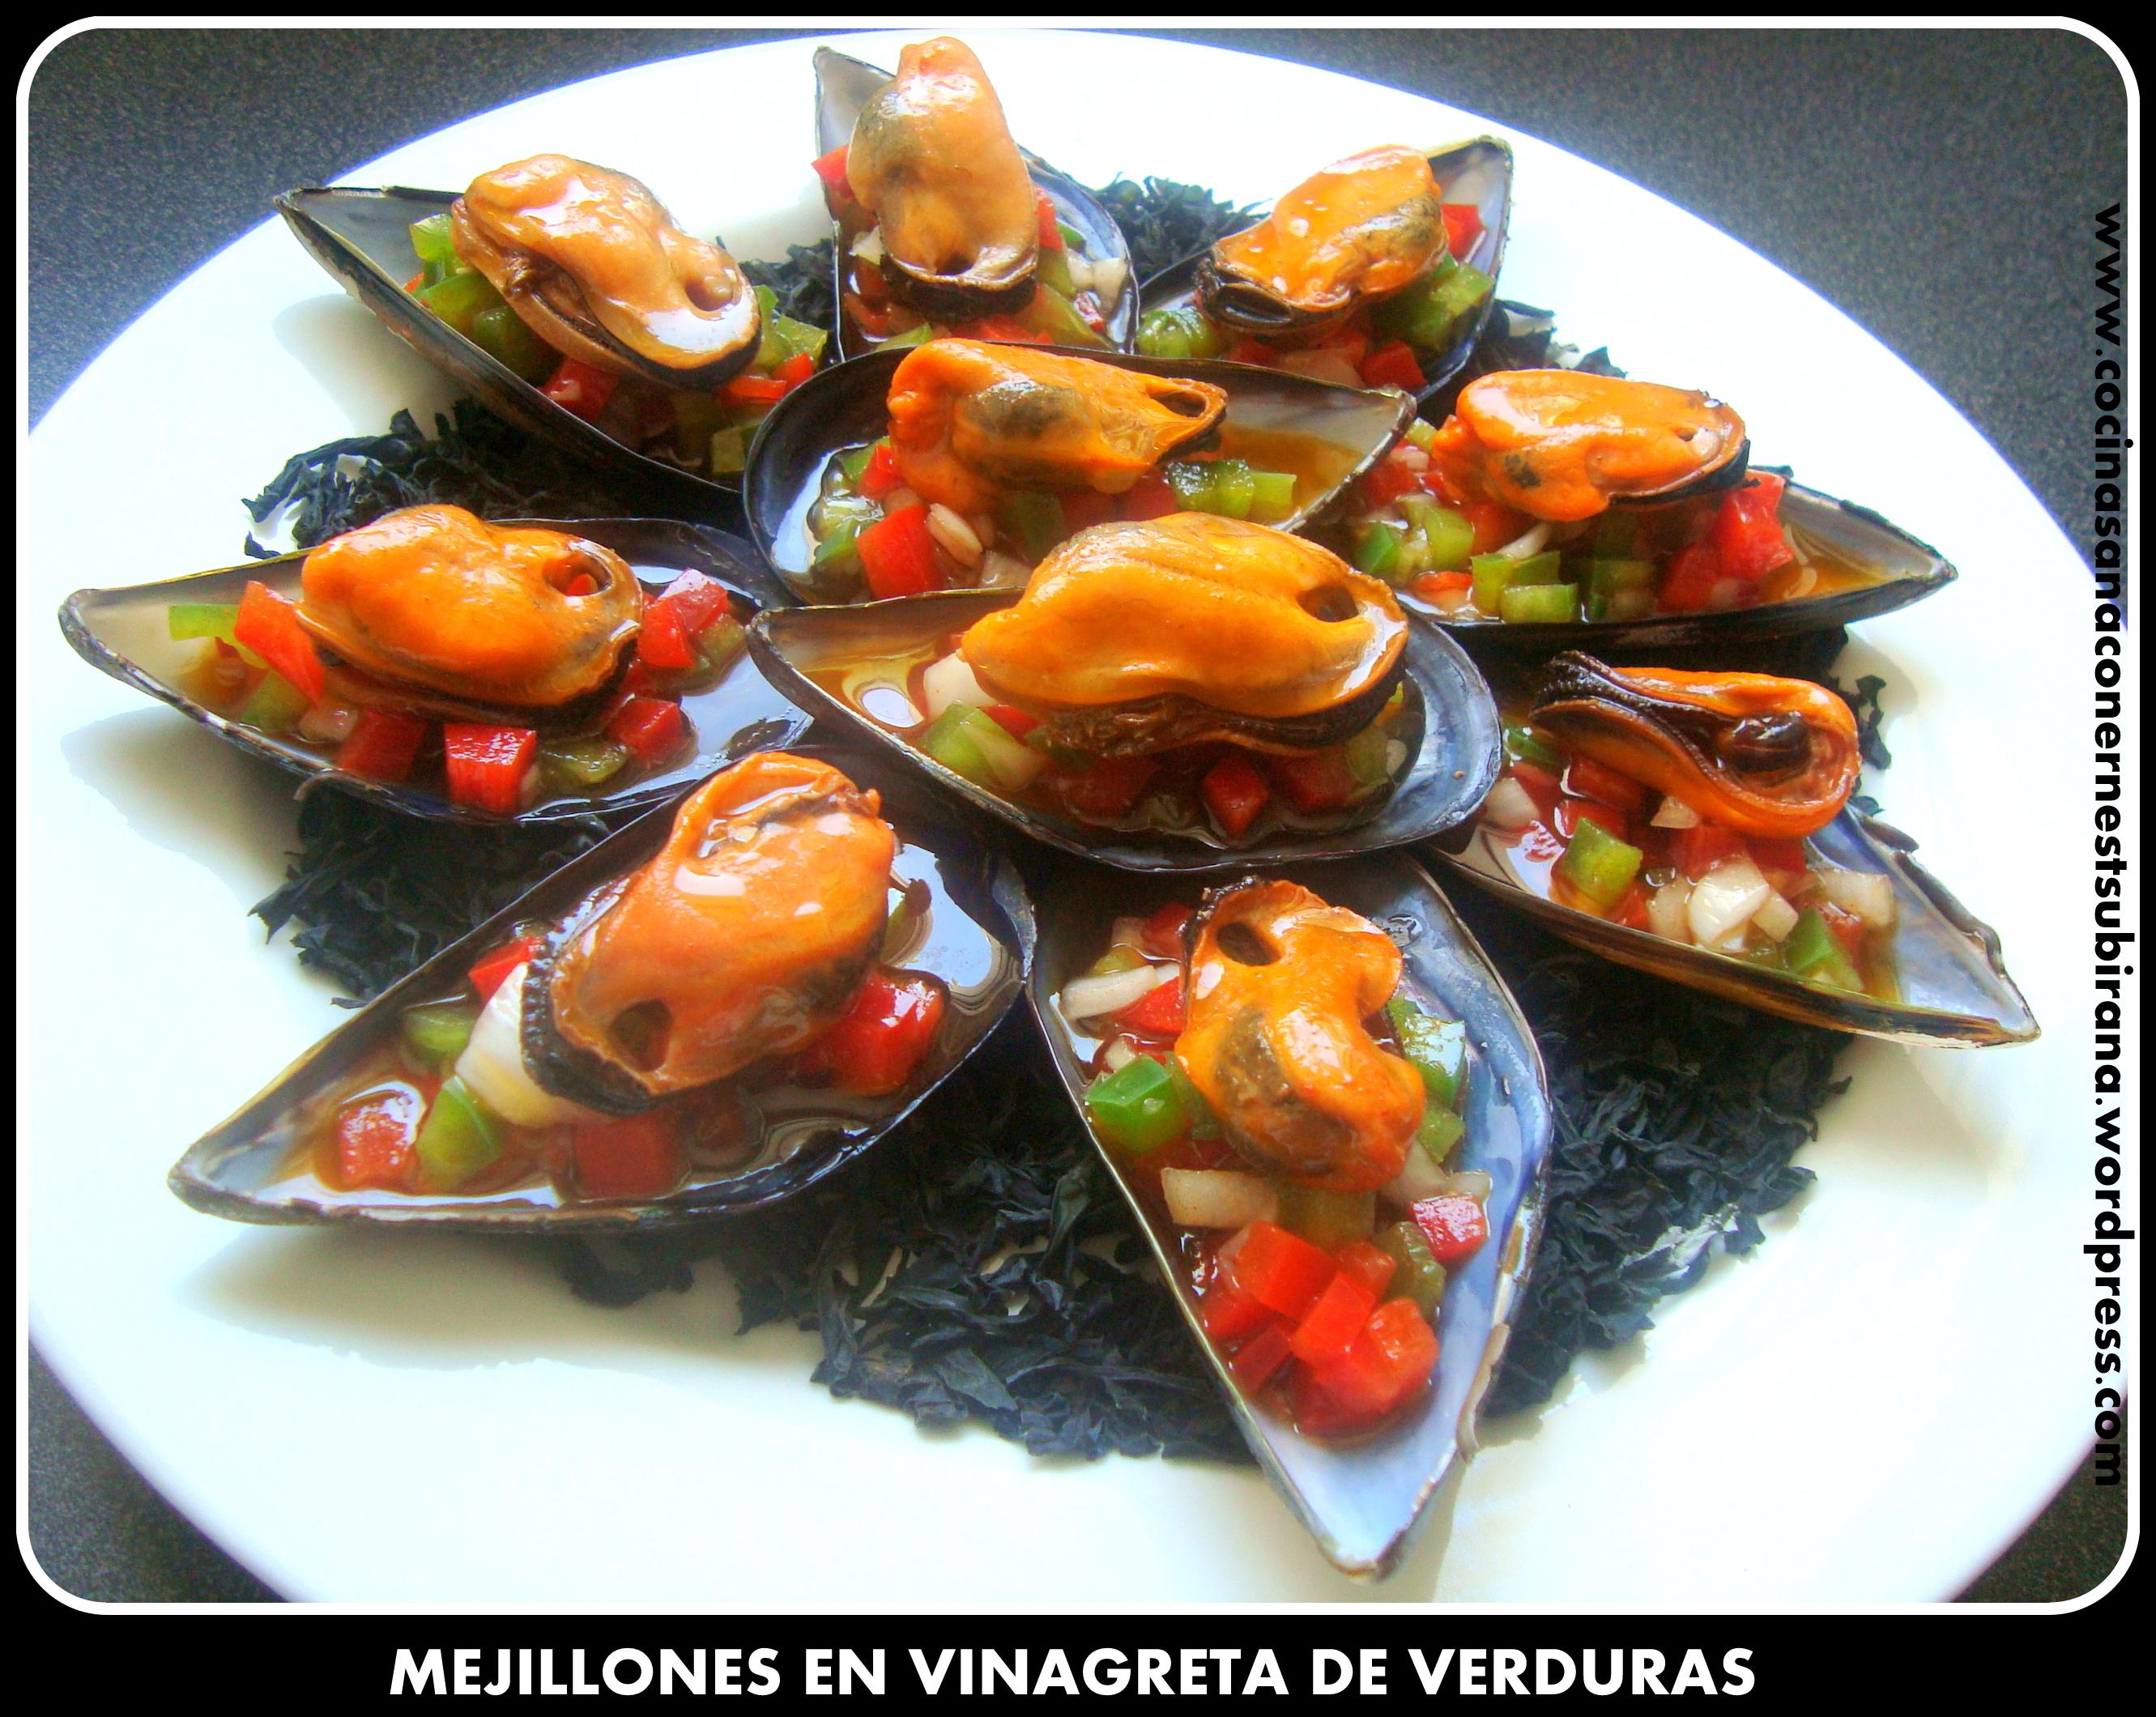 Mejillones en vinagreta - Mejillones al vapor con vinagreta ...